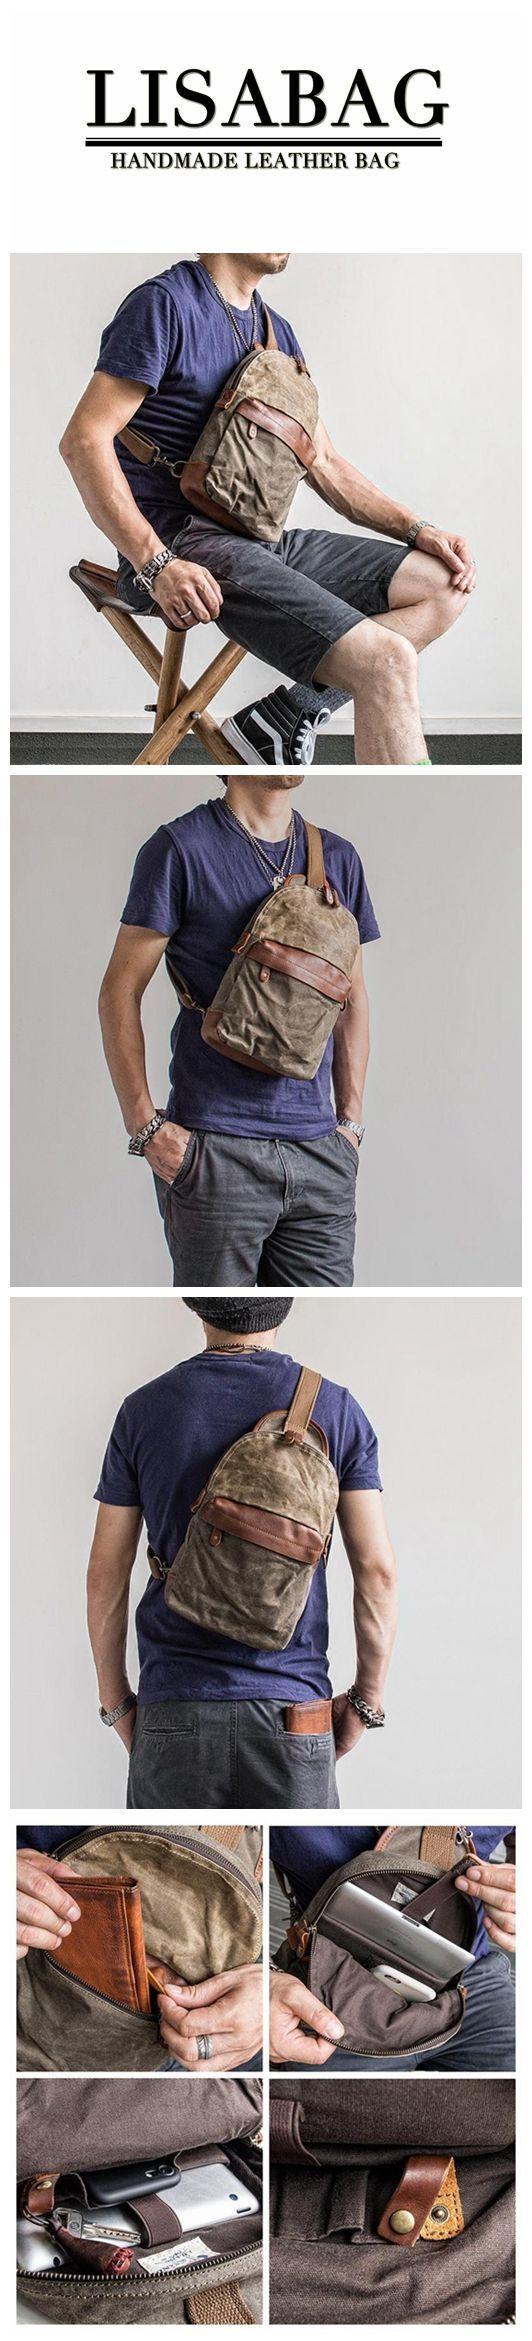 23f13e634f Handmade Waxed Canvas Chest Bag Sling Backpack Crossbody Bag Small Satchel  MBL18  messengerhandbags